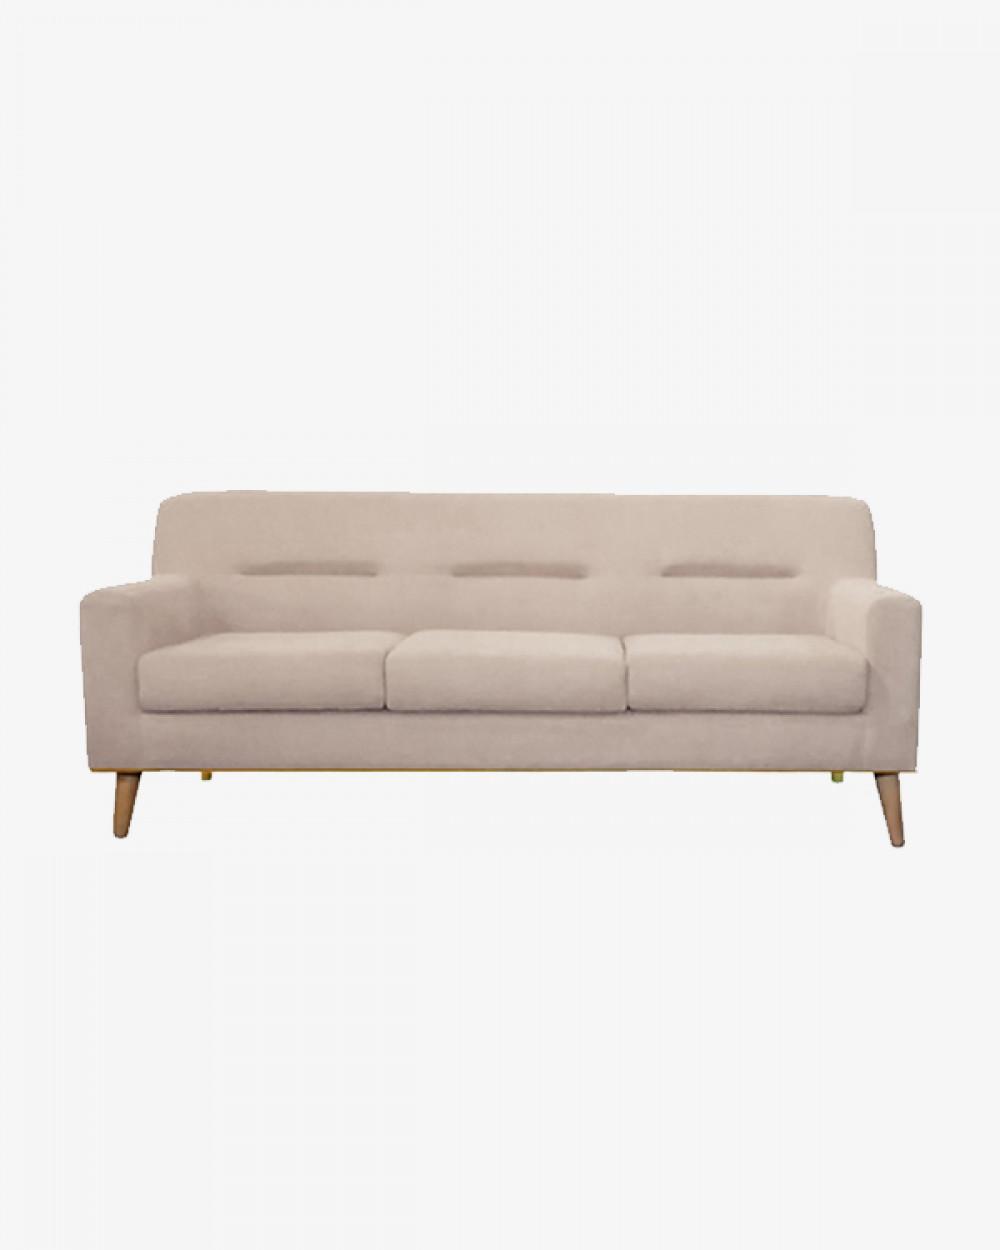 Sofie Sofa (Misty Beige) I 3 Seater